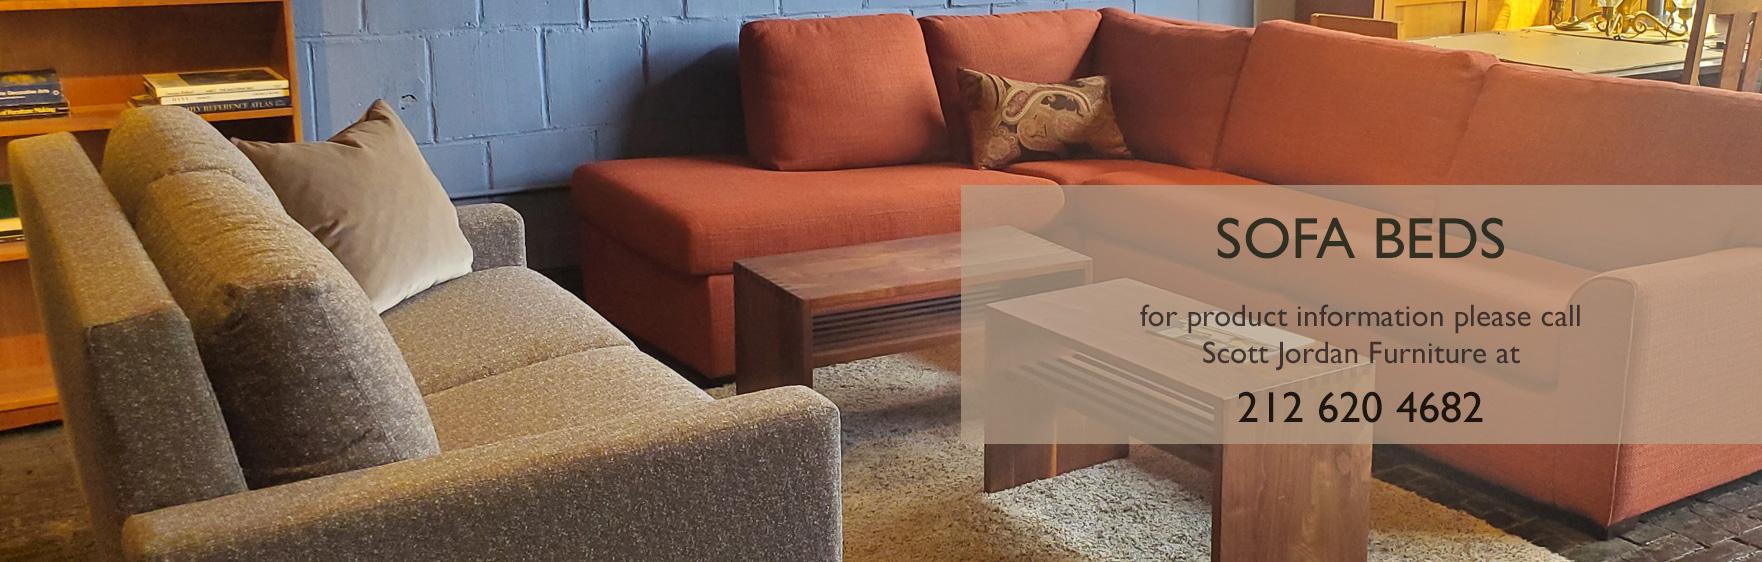 Sofa Beds from Scott Jordan